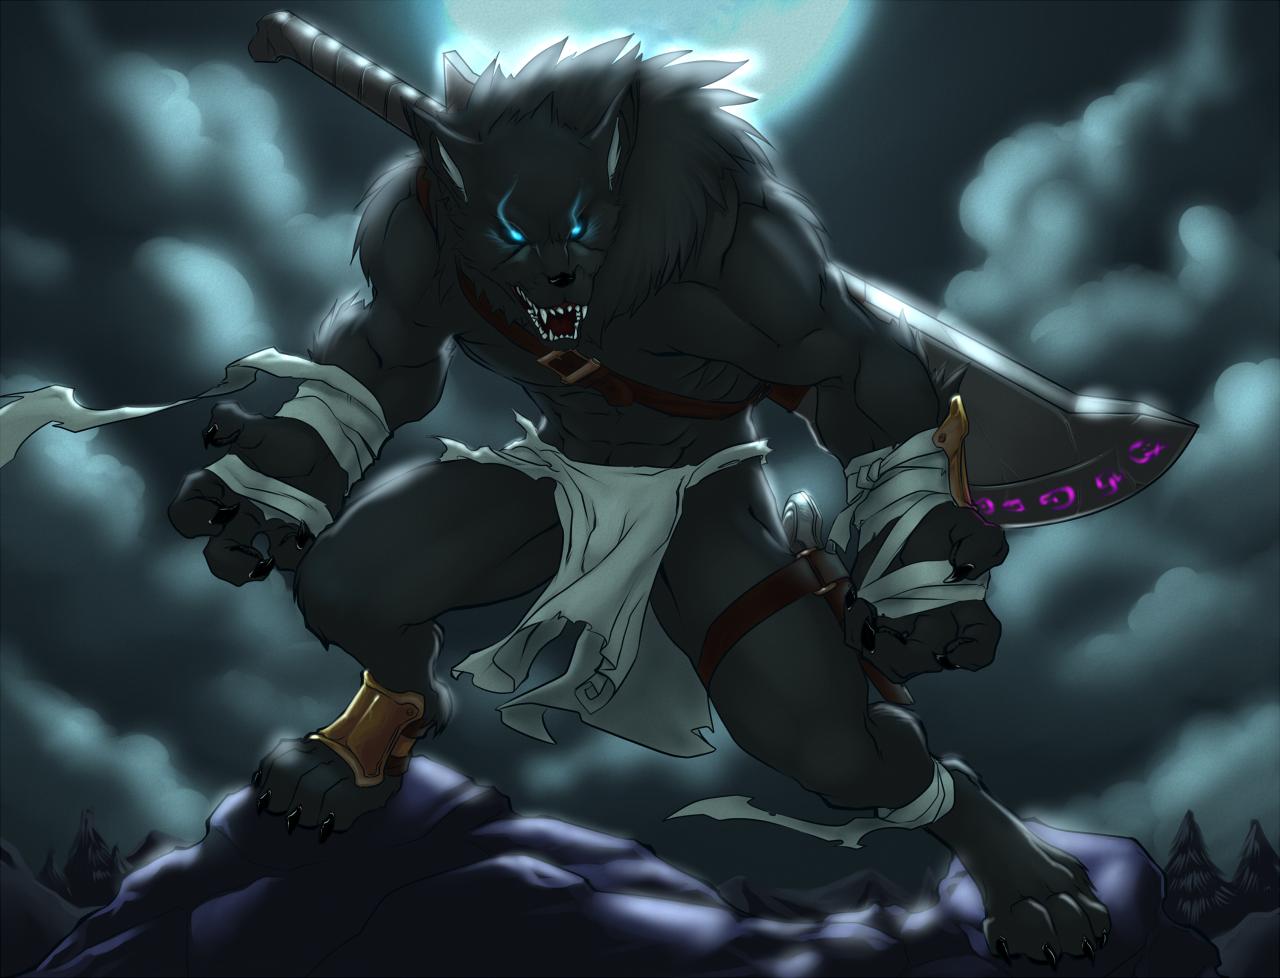 Anime Wolf Wallpapers - WallpaperSafari